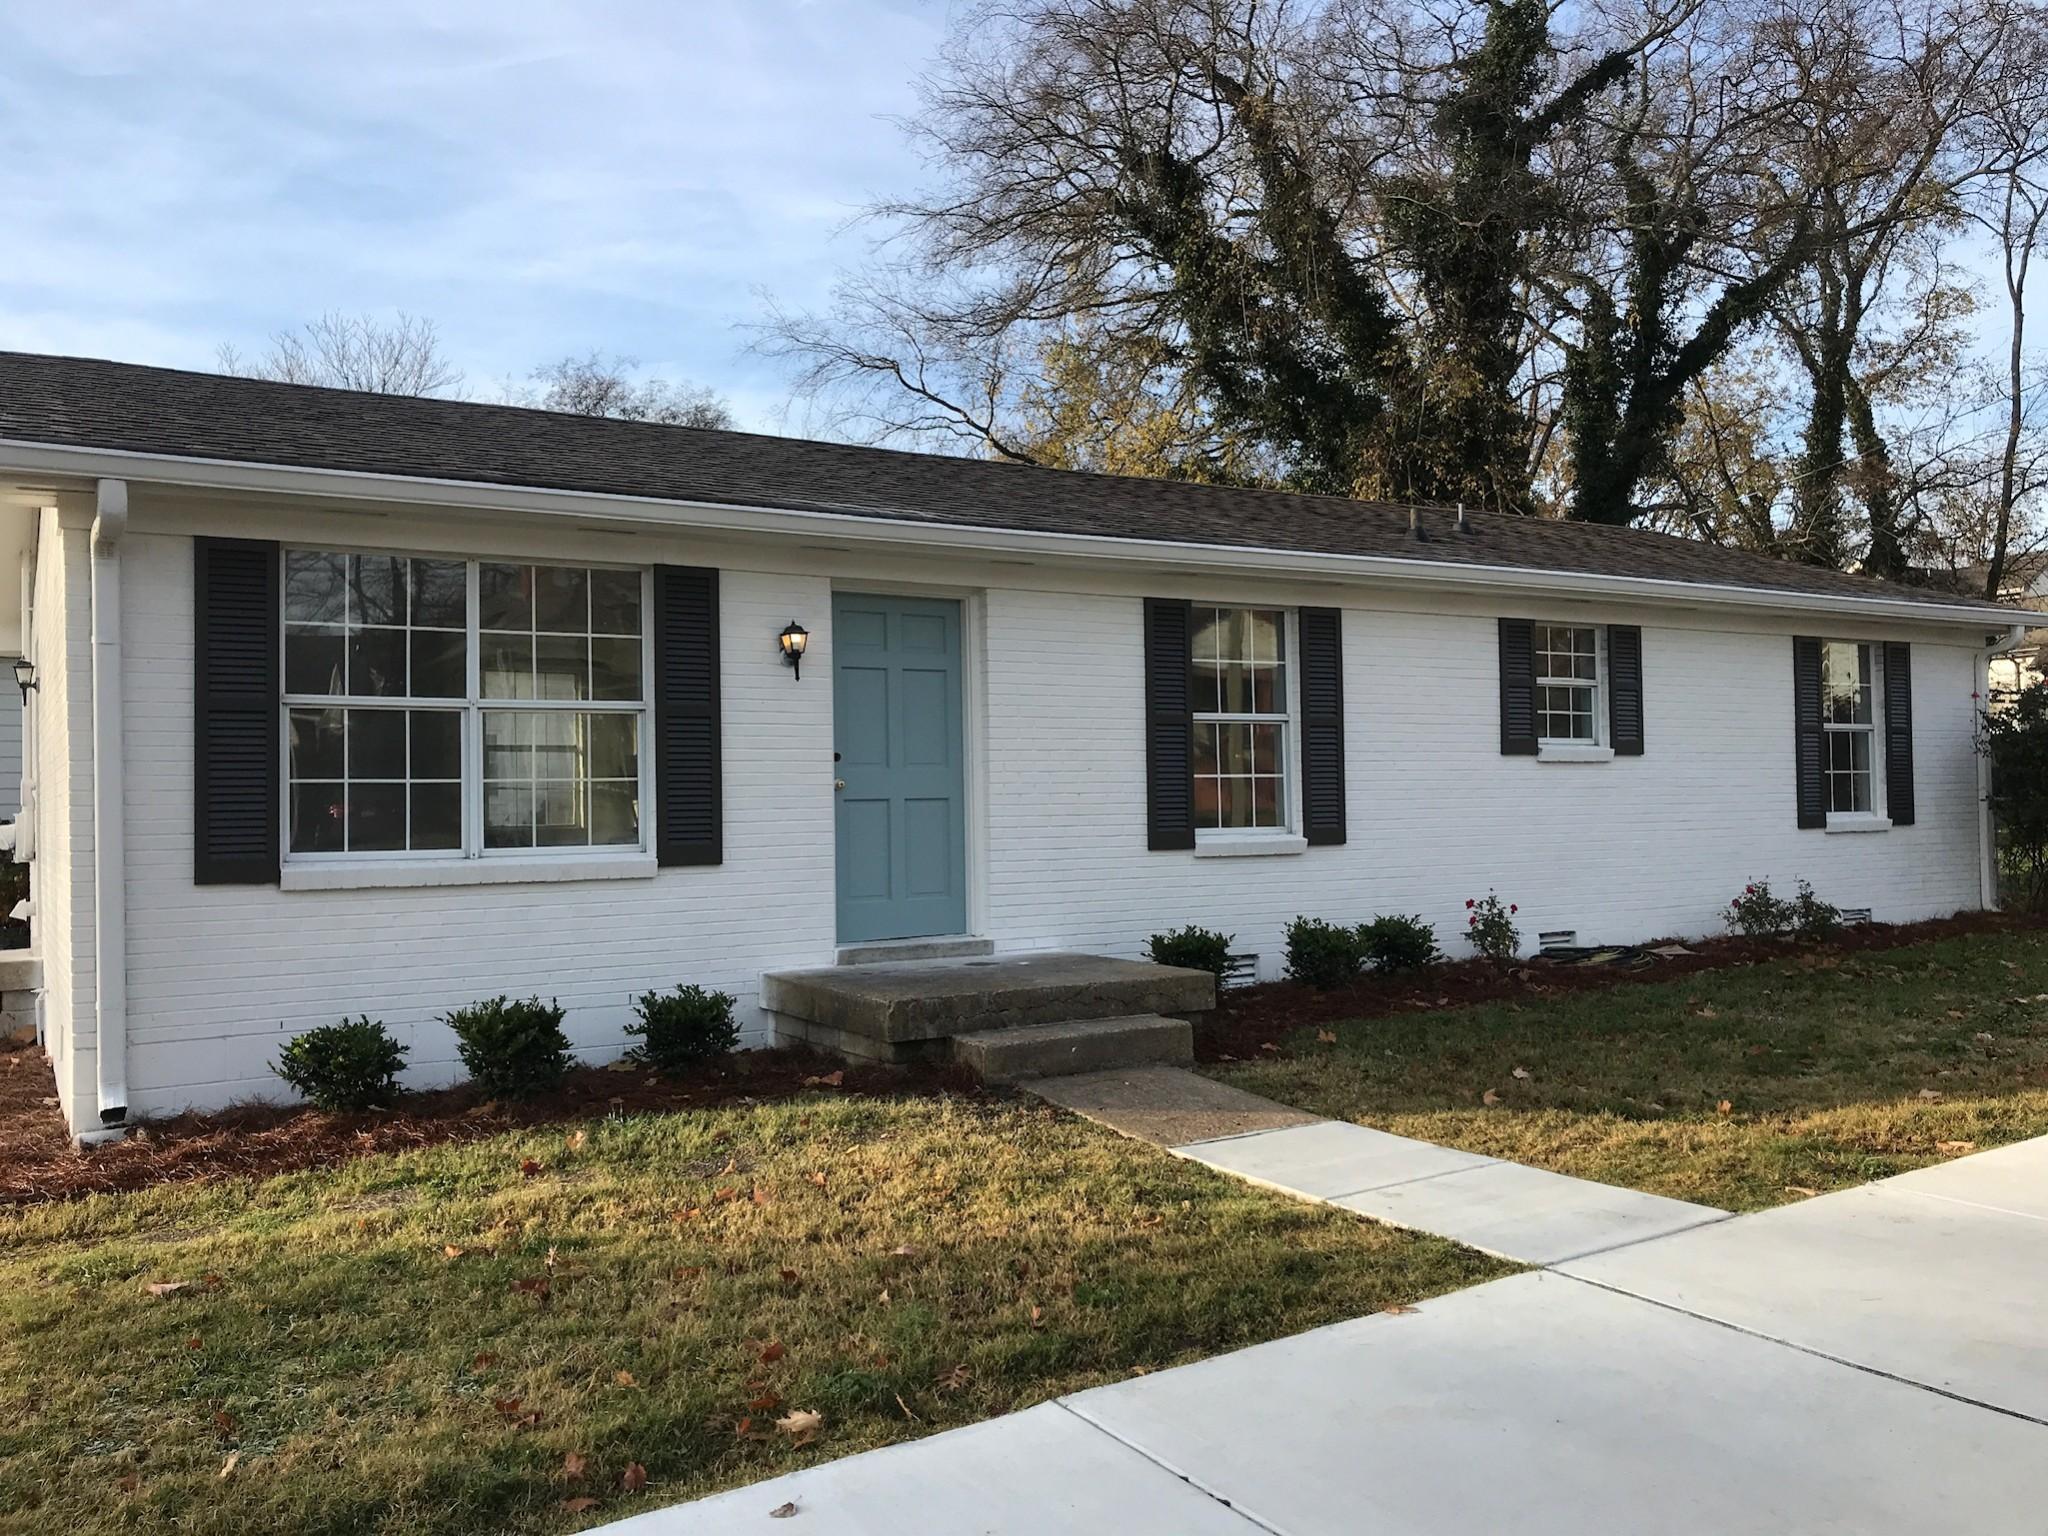 2101 10th Ave S Property Photo - Nashville, TN real estate listing